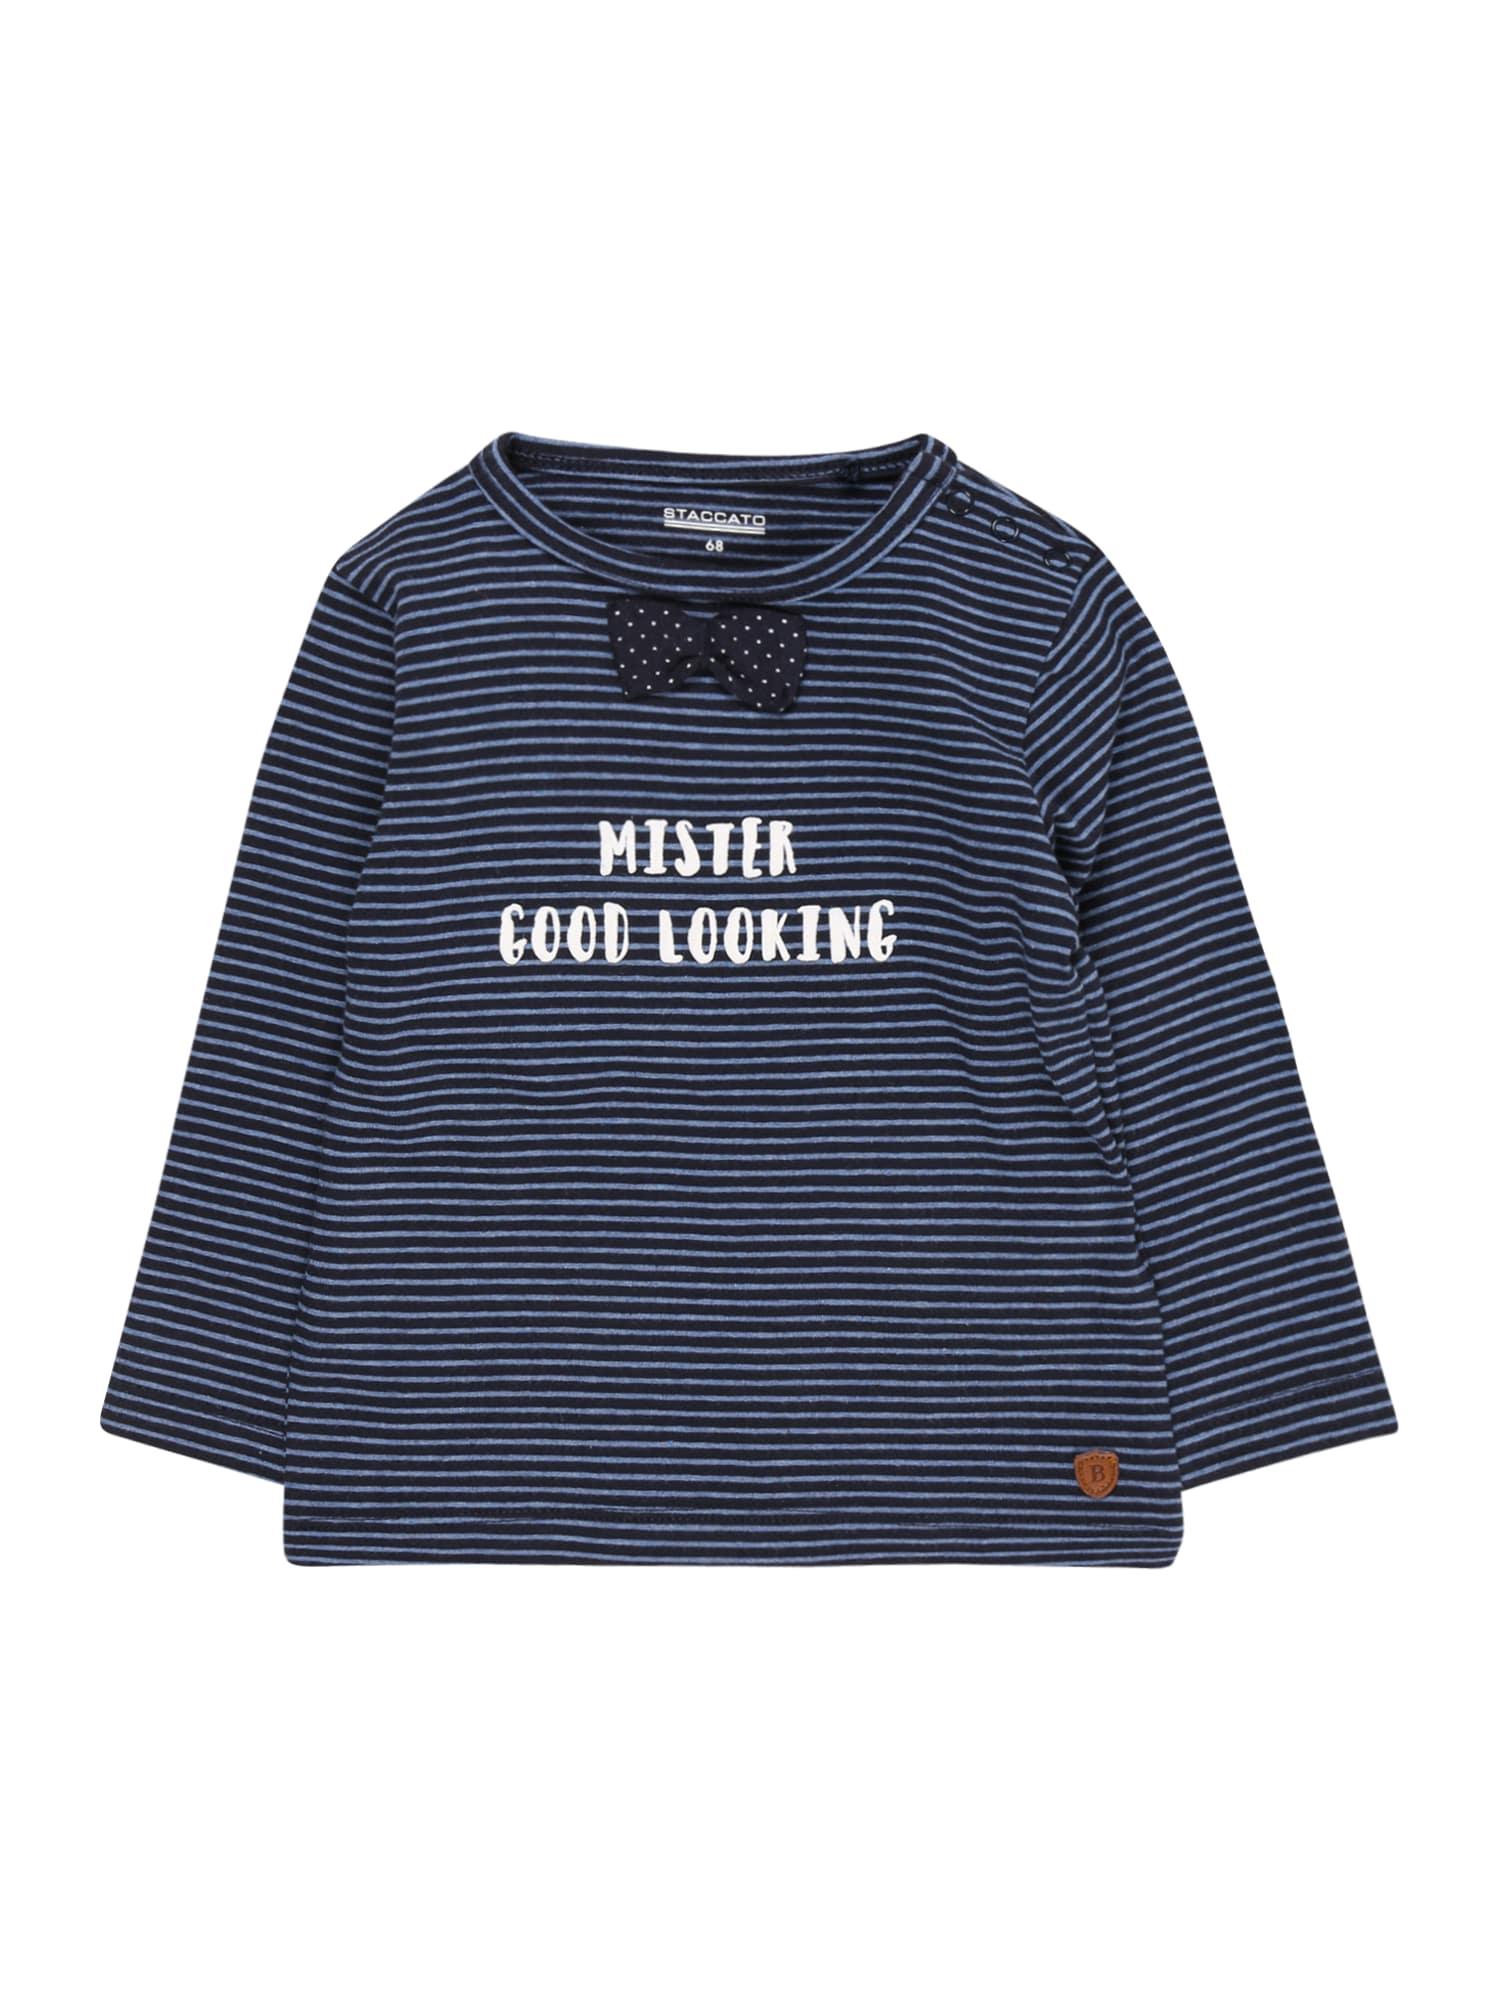 STACCATO Marškinėliai tamsiai mėlyna / mėlyna dūmų spalva / balta